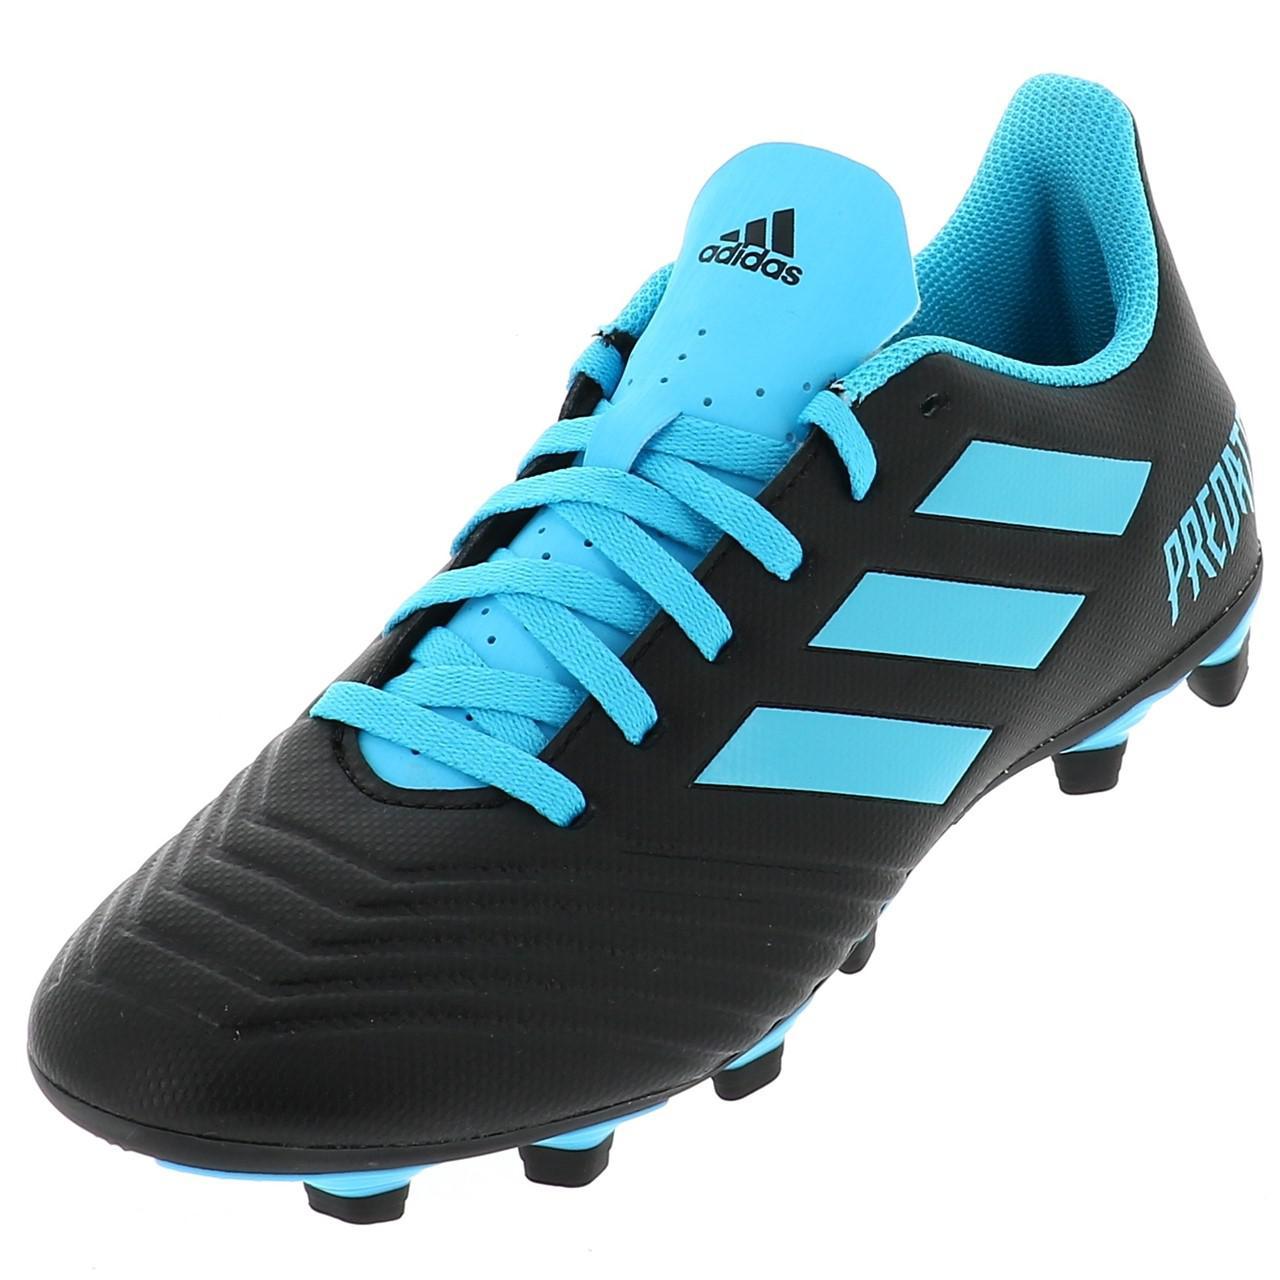 Chaussures-football-lamelles-Adidas-Predator-19-4-fg-grorg-Noir-42821-Neuf